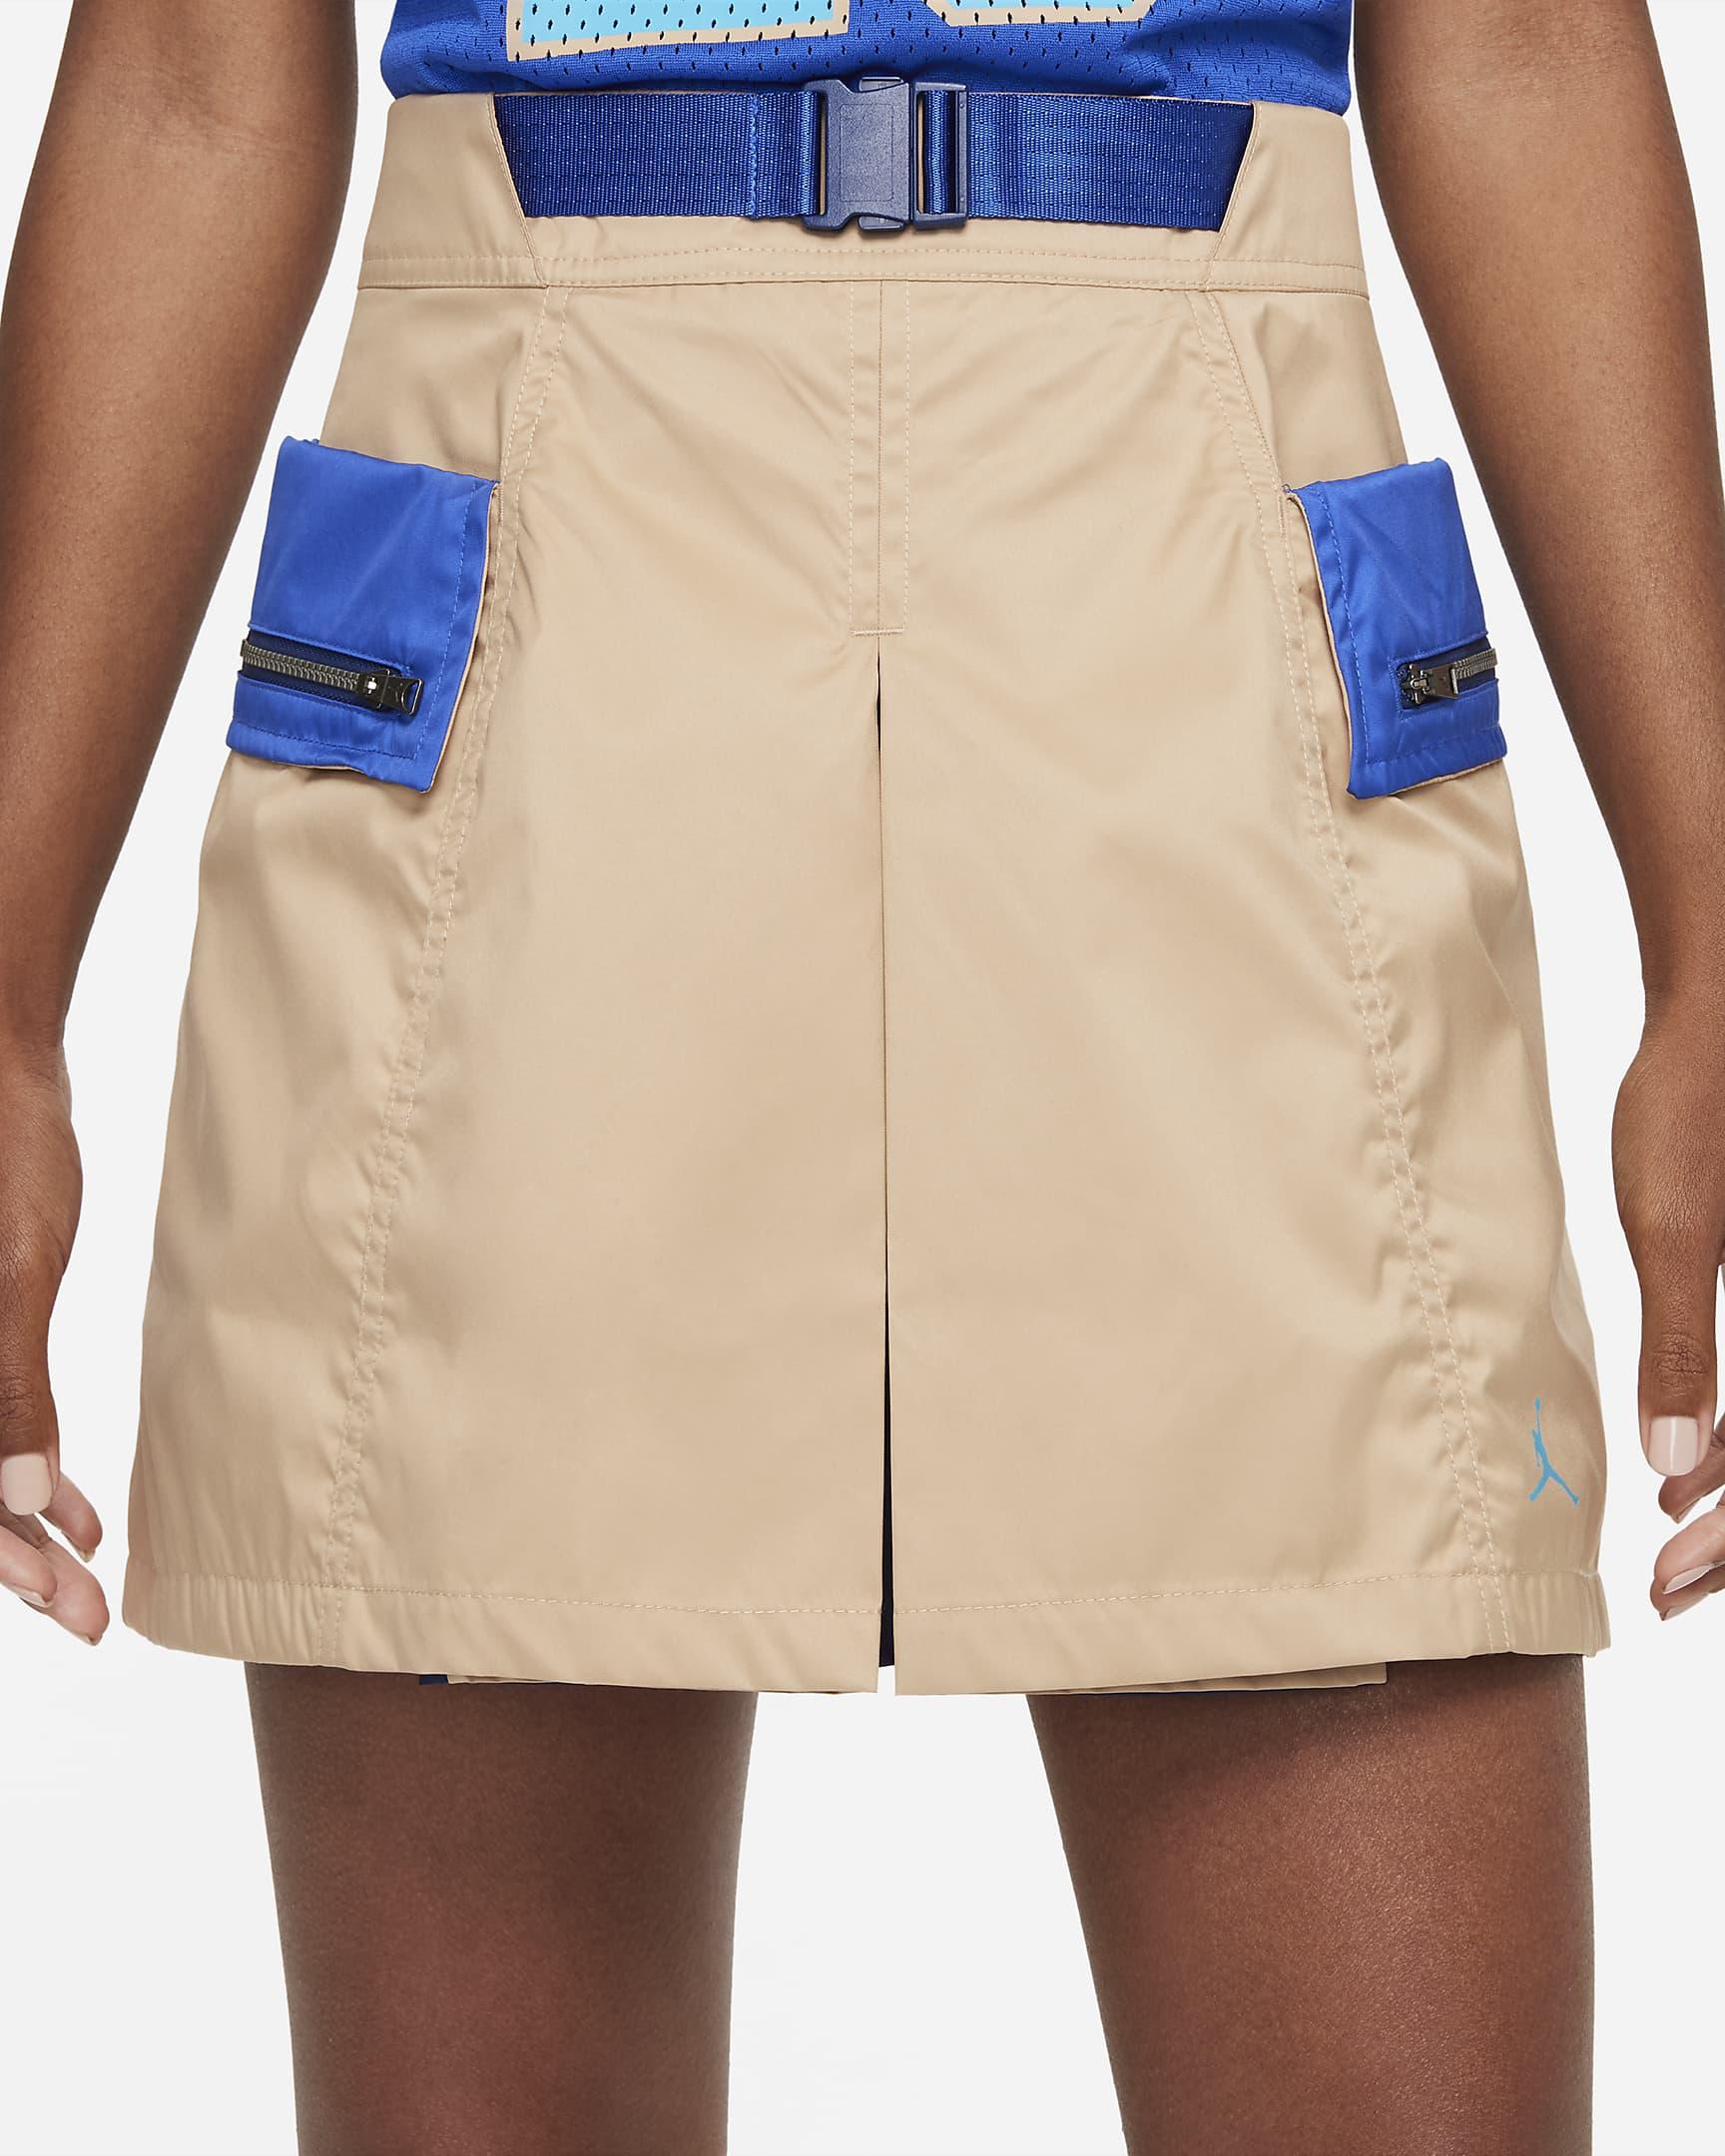 jordan-next-utility-capsule-womens-skirt-MfHhwN-1.png